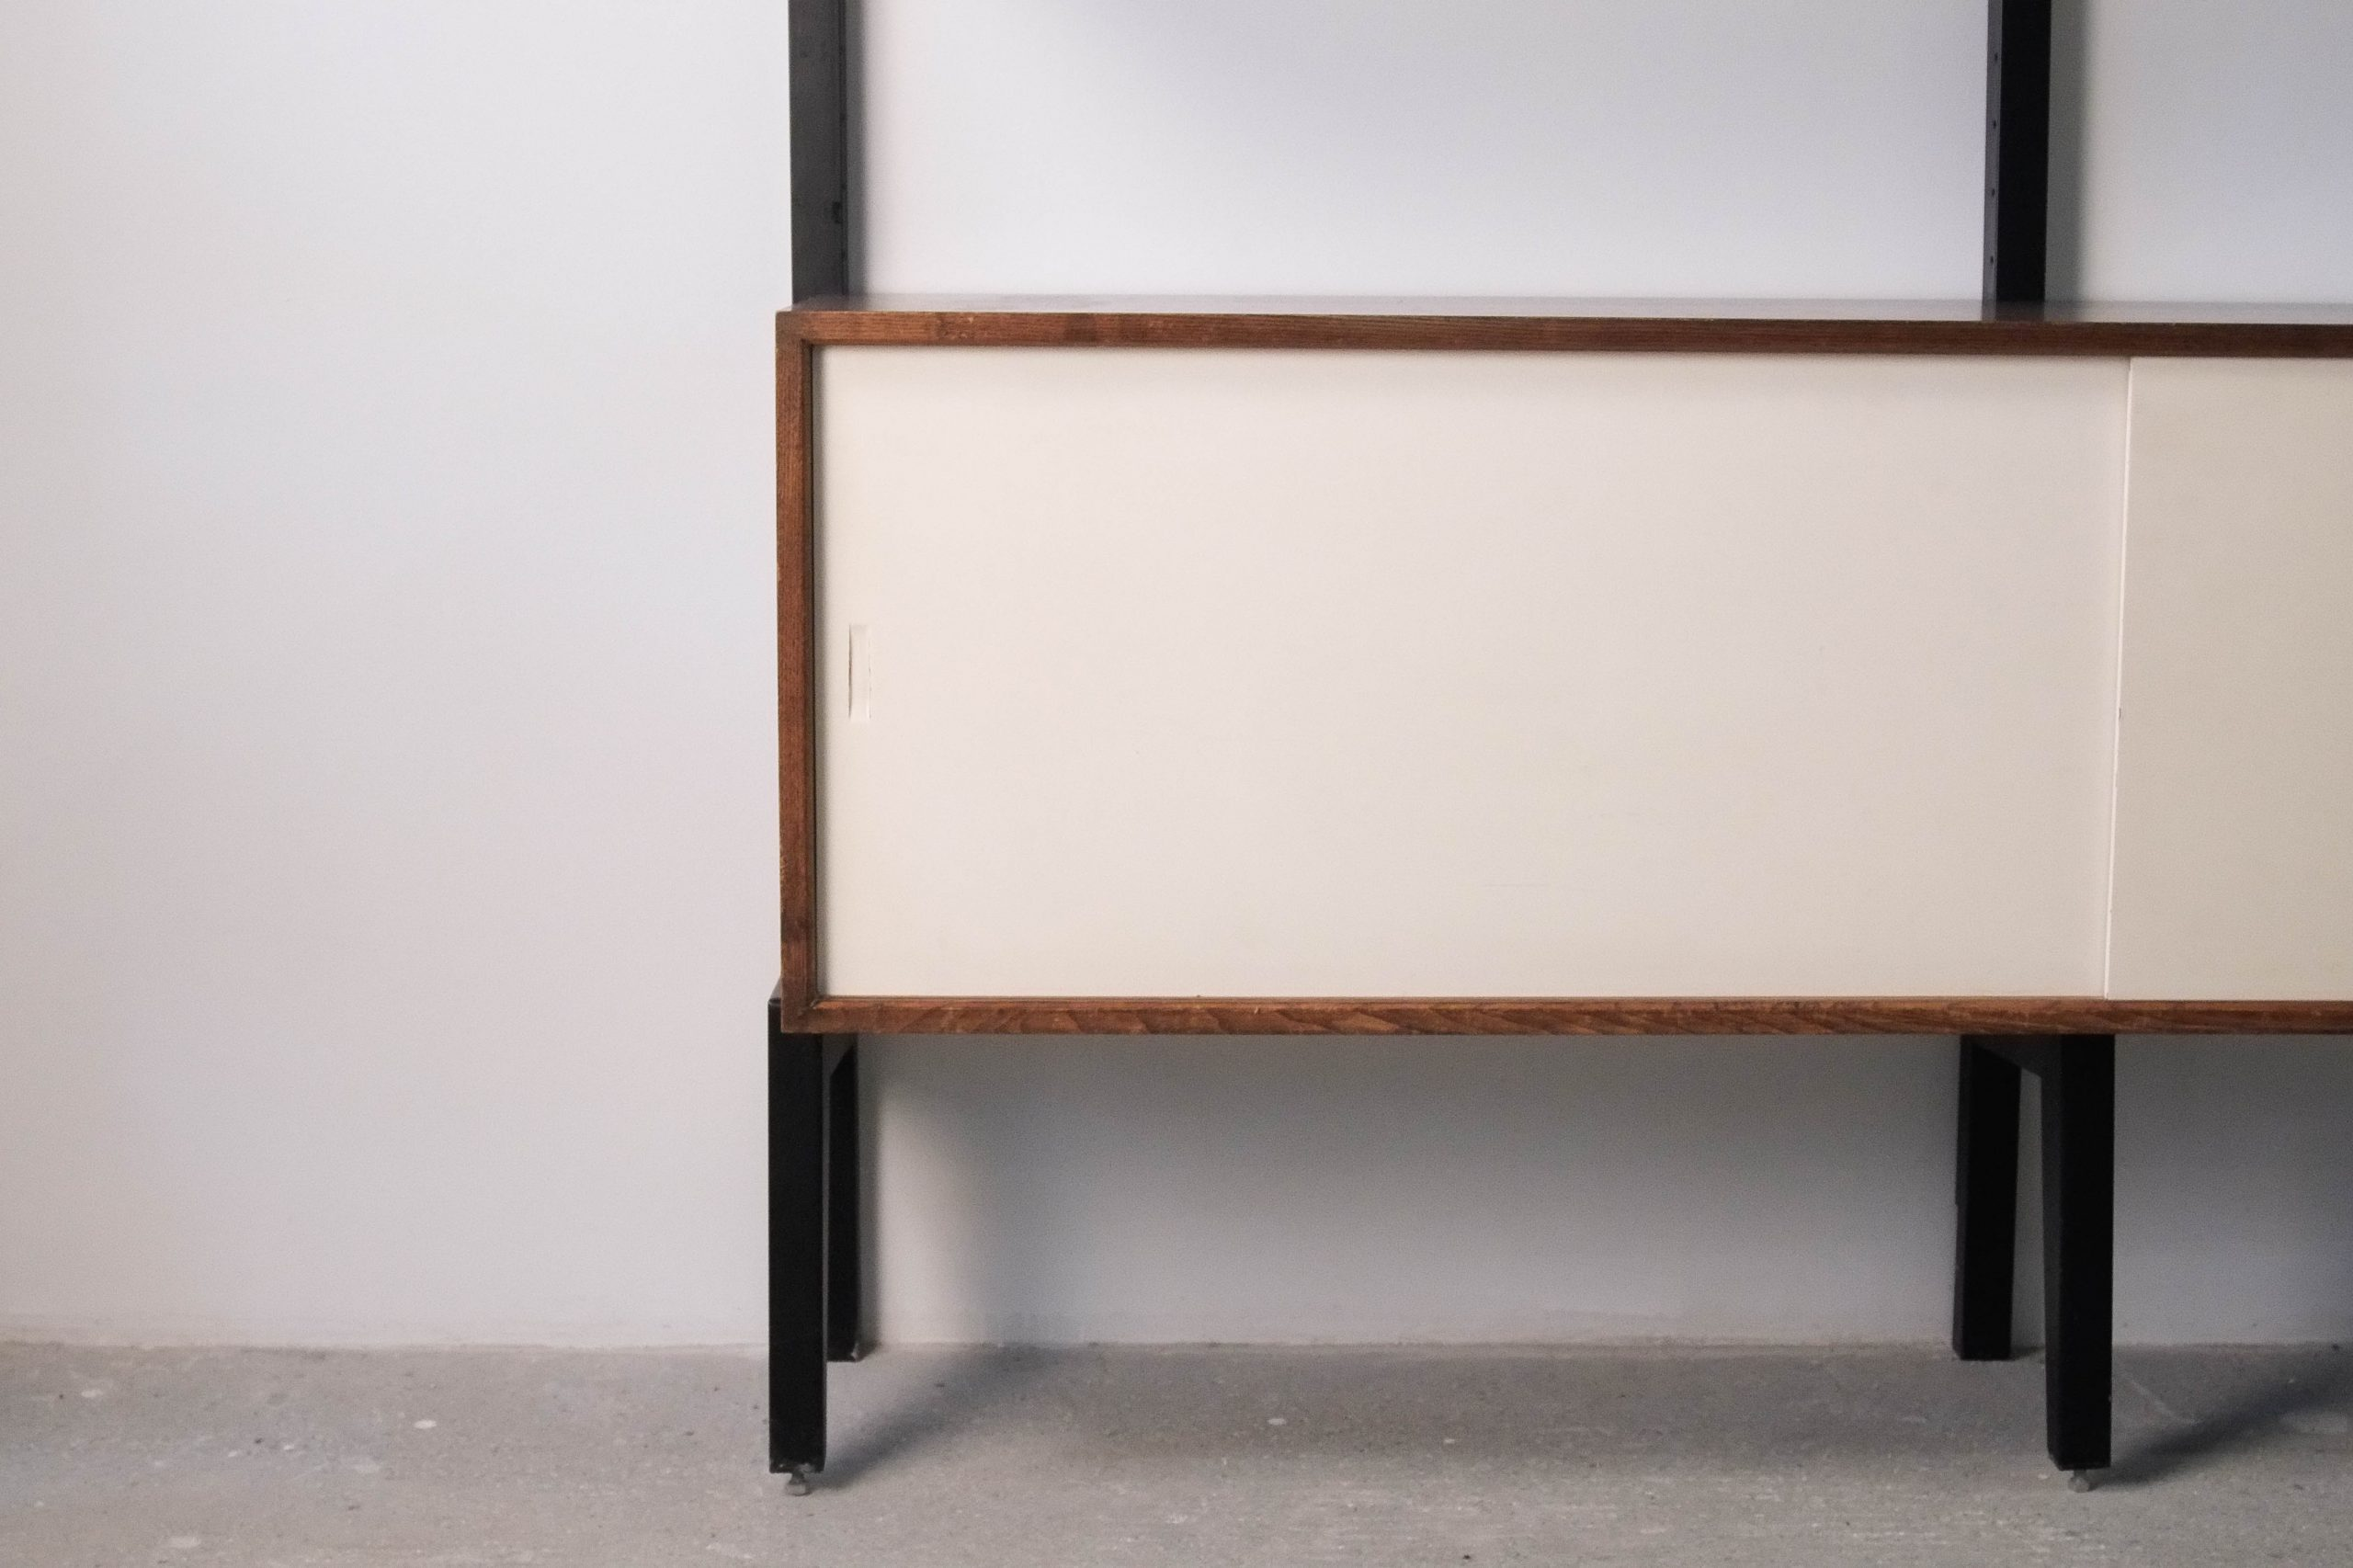 estanteria mid century de palosanto y metal modular sistema